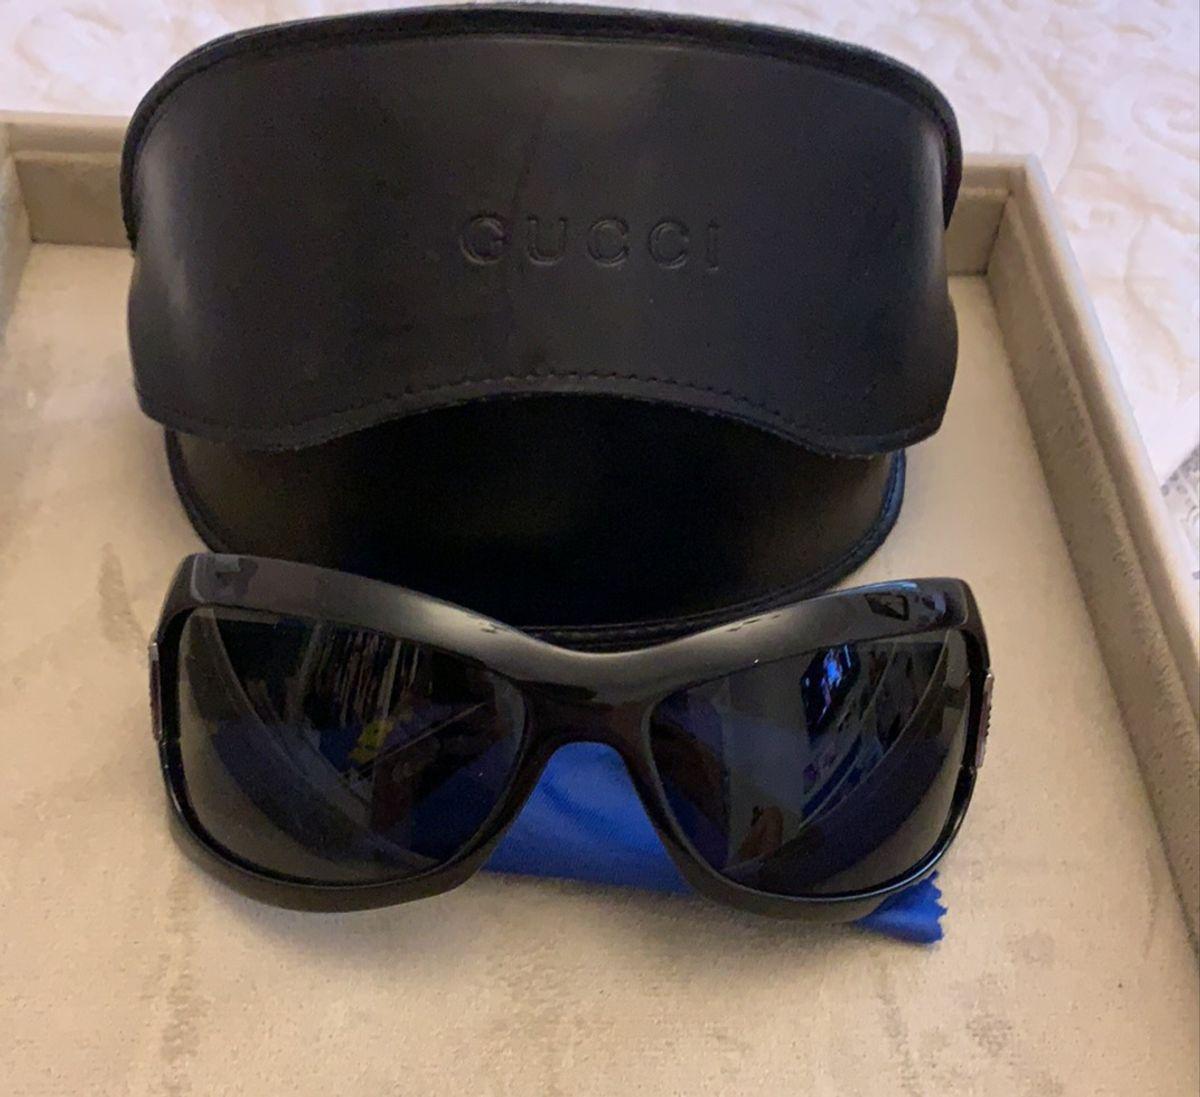 óculos gucci - óculos gucci.  Czm6ly9wag90b3muzw5qb2vplmnvbs5ici9wcm9kdwn0cy81nje5mjq5lzkwndi1ndbhmji5yte5odvjzgmymgu0ytzlytewzje1lmpwzw  ... 5666ace0a5